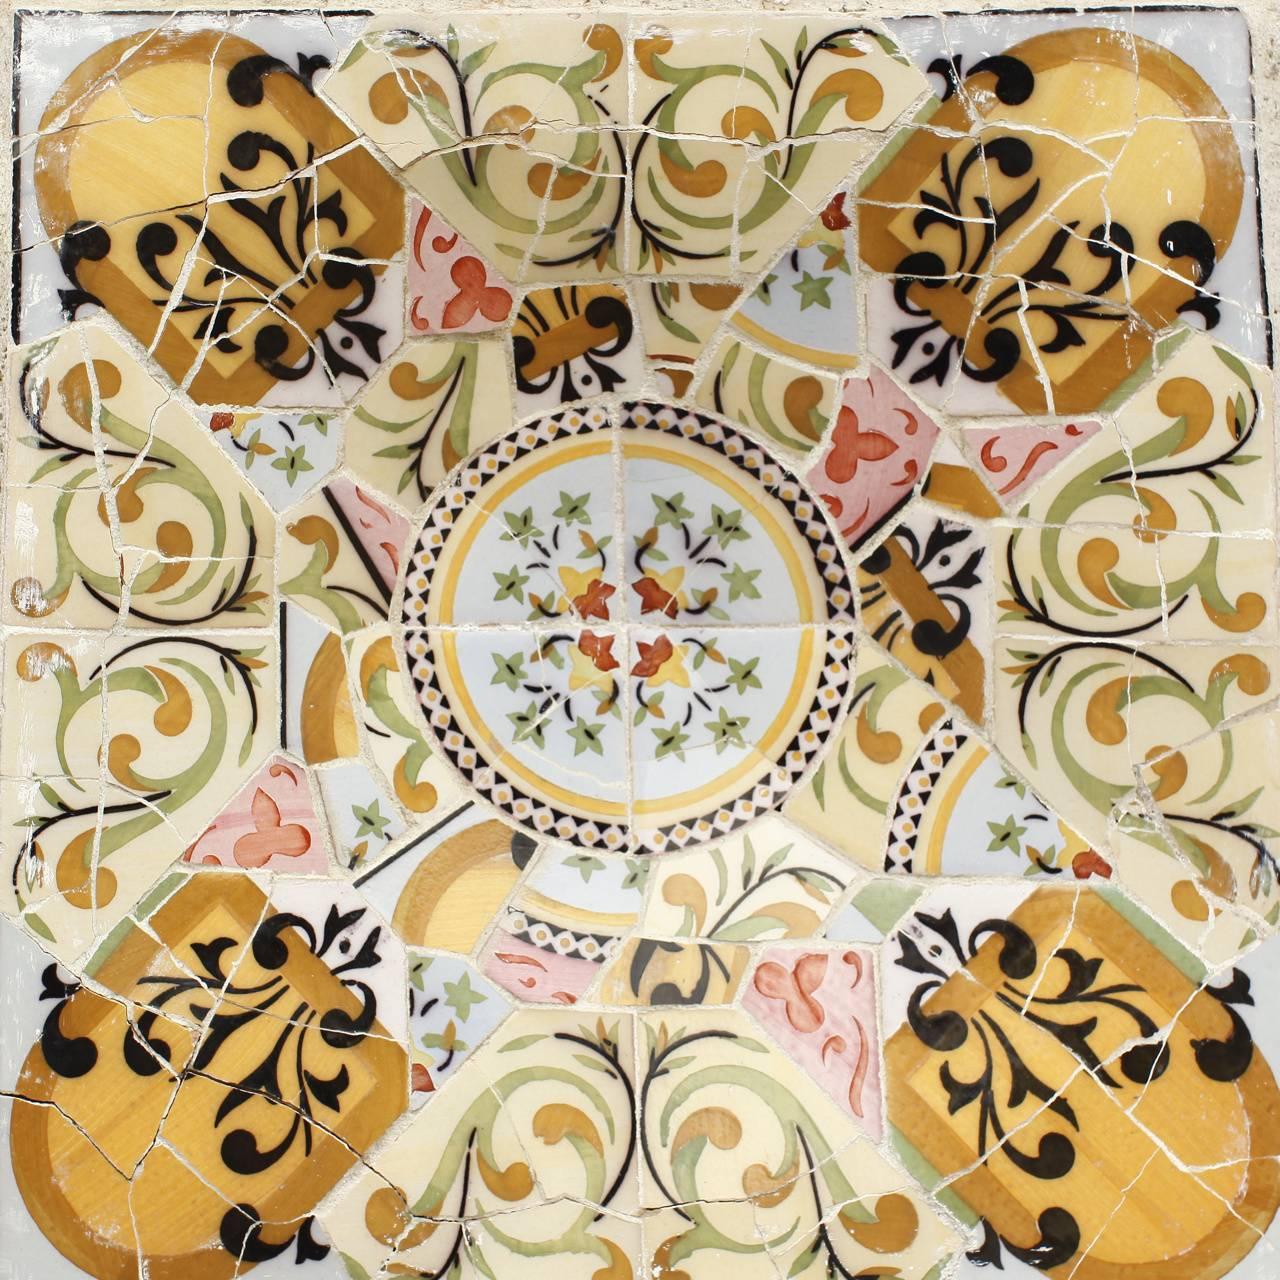 Gaudi Ceramics Iii